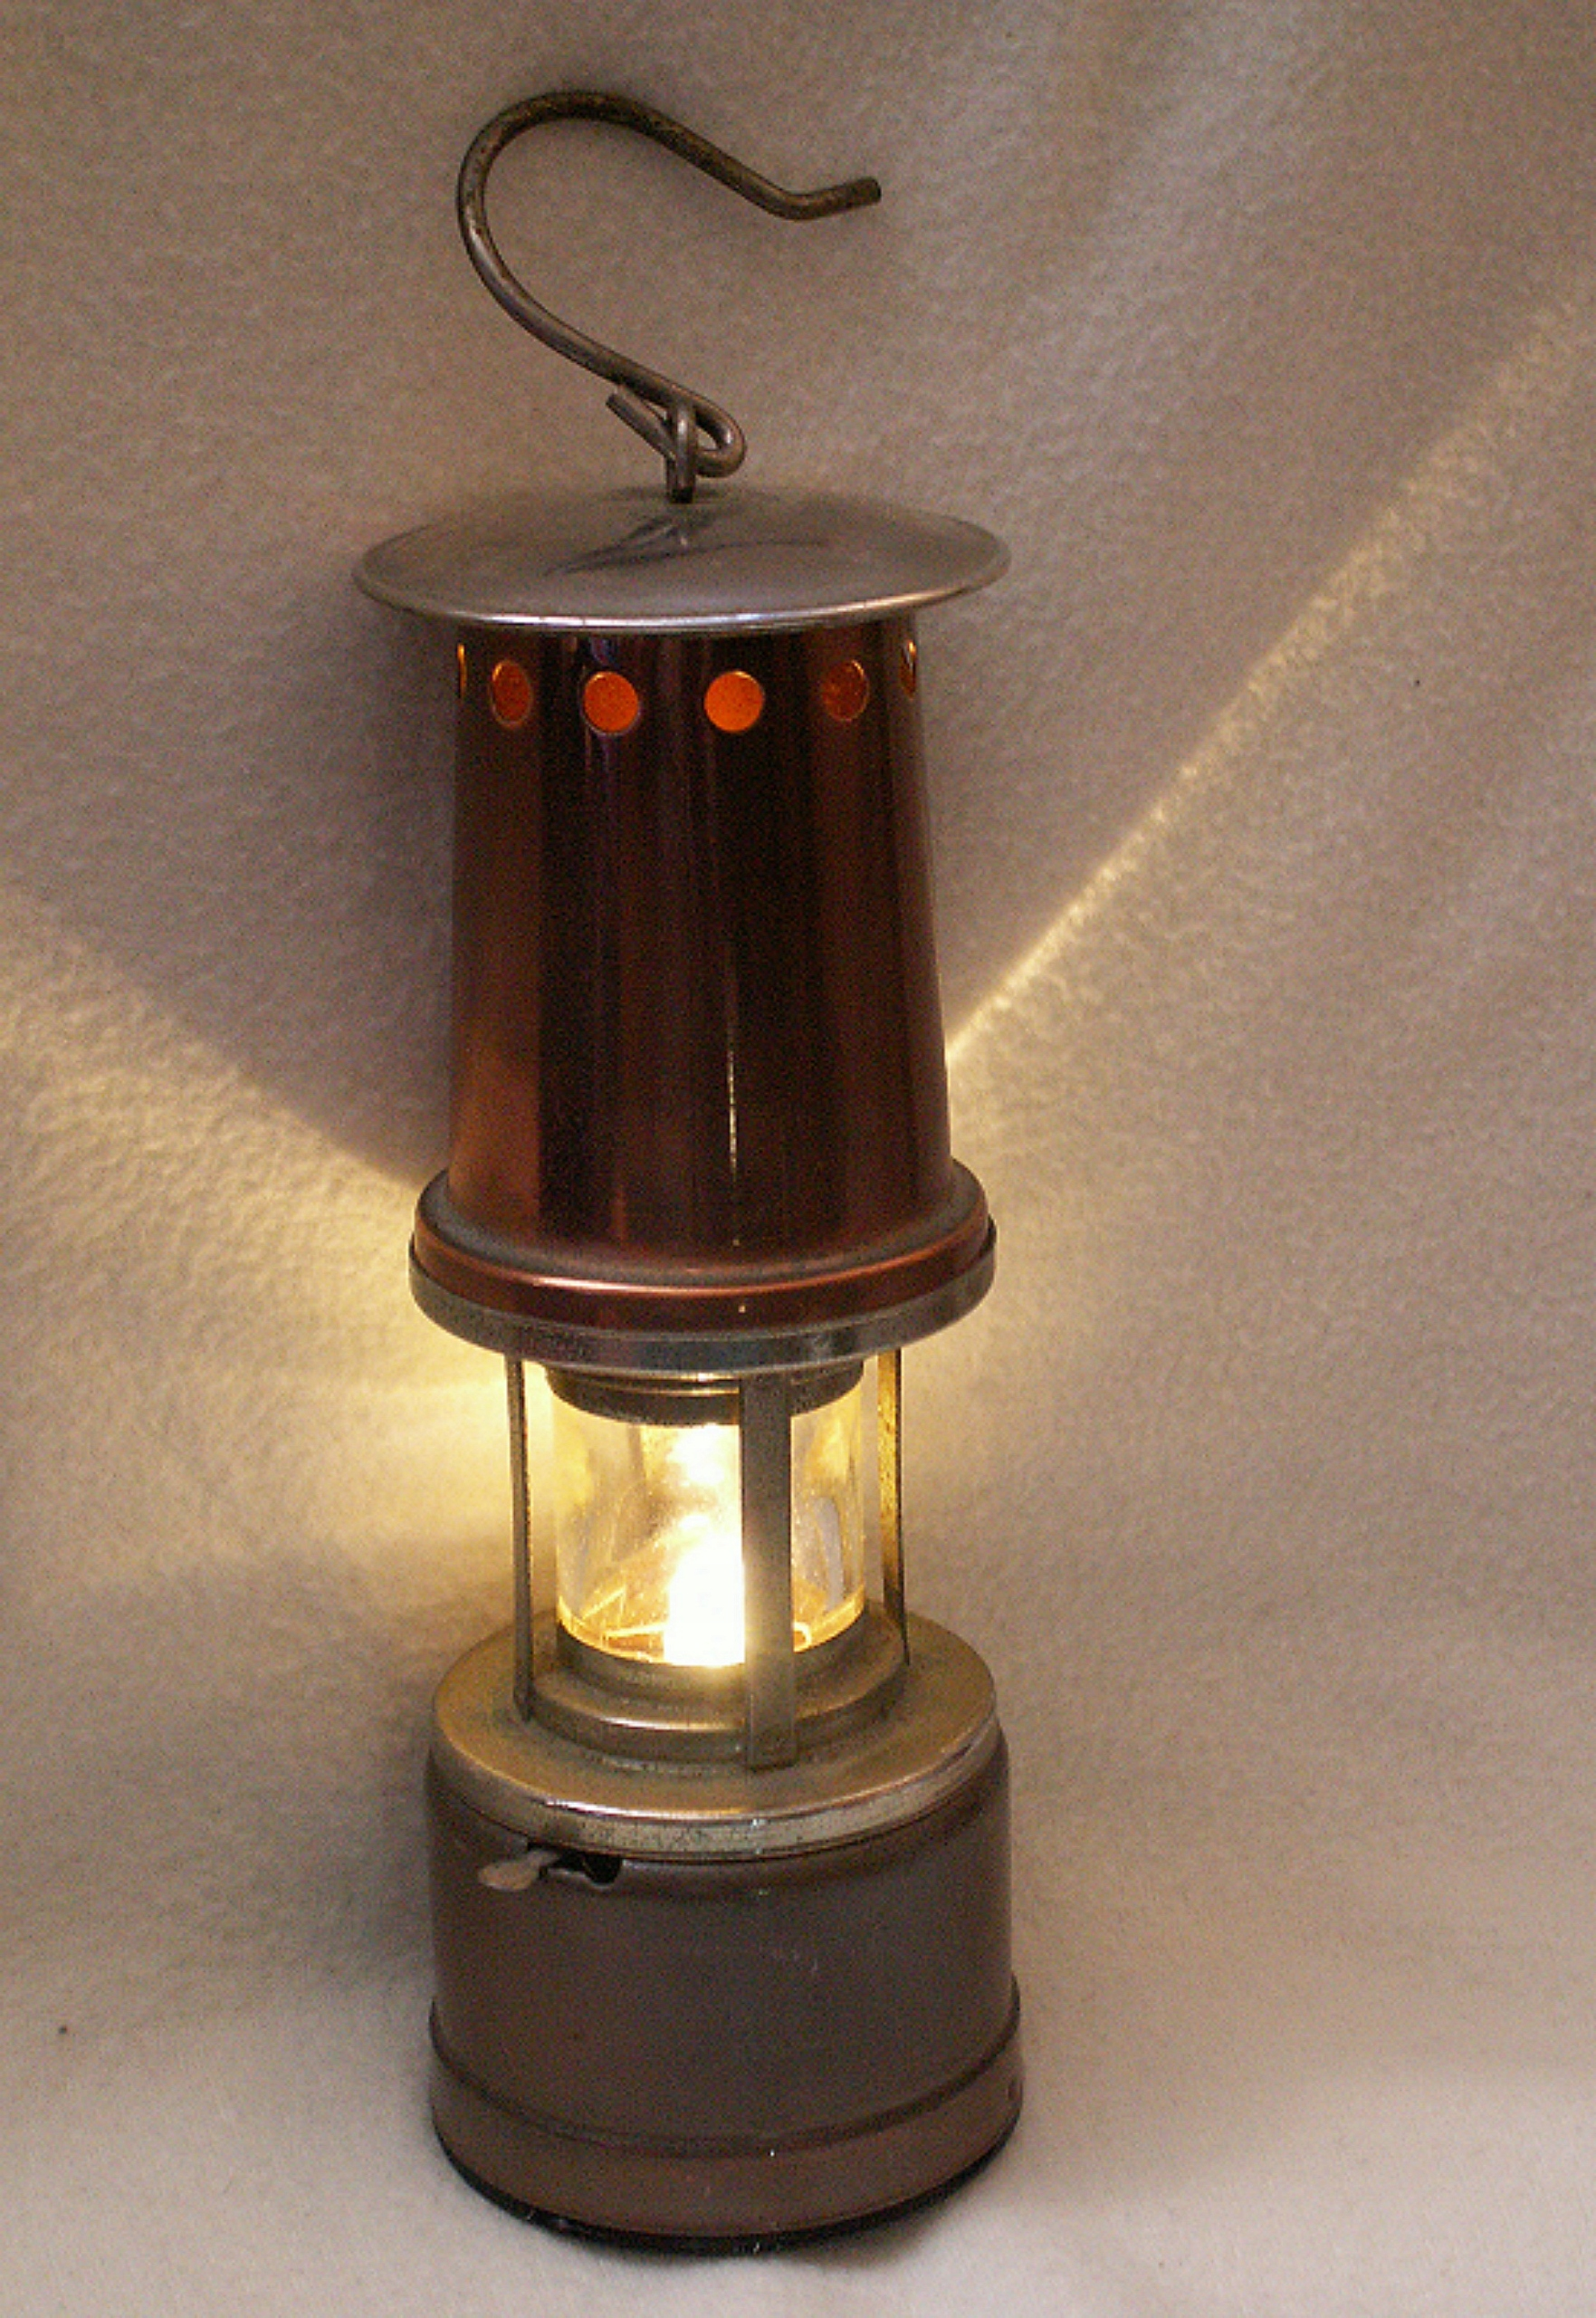 Stara lampa gornicza jak naftowa Grubenlampe+$$$$$